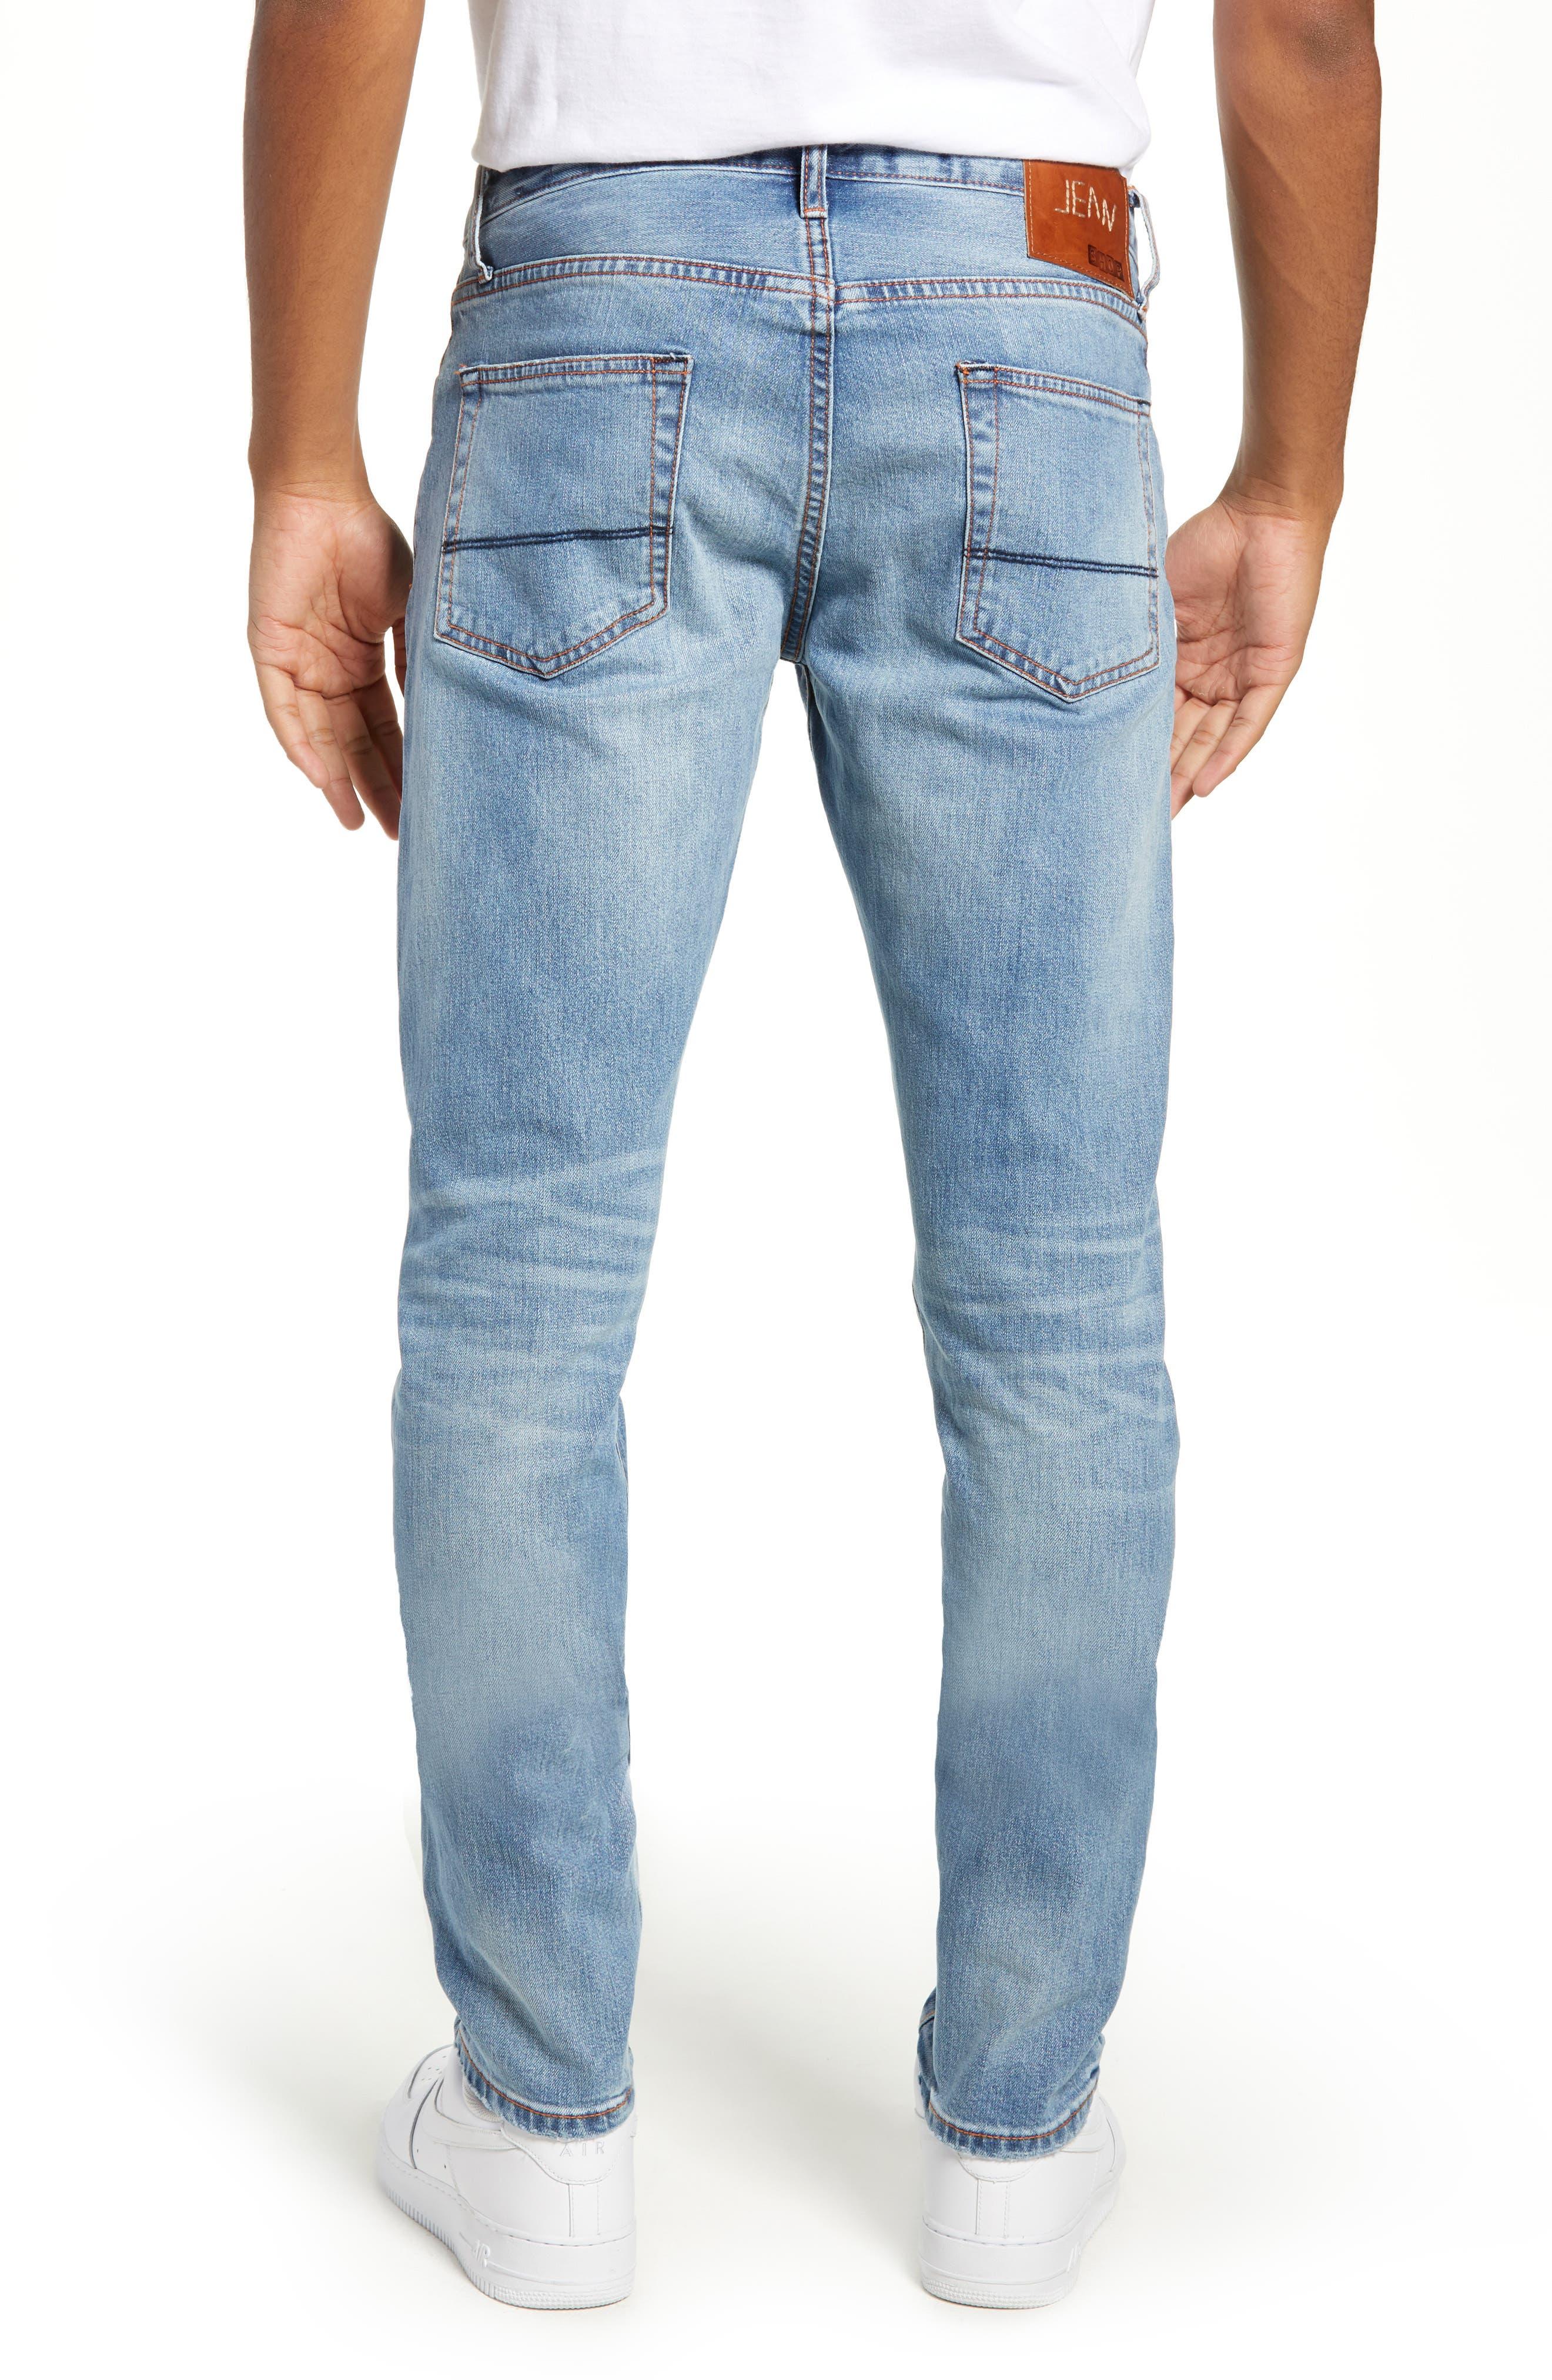 Jim Slim Fit Jeans,                             Alternate thumbnail 2, color,                             BROOME